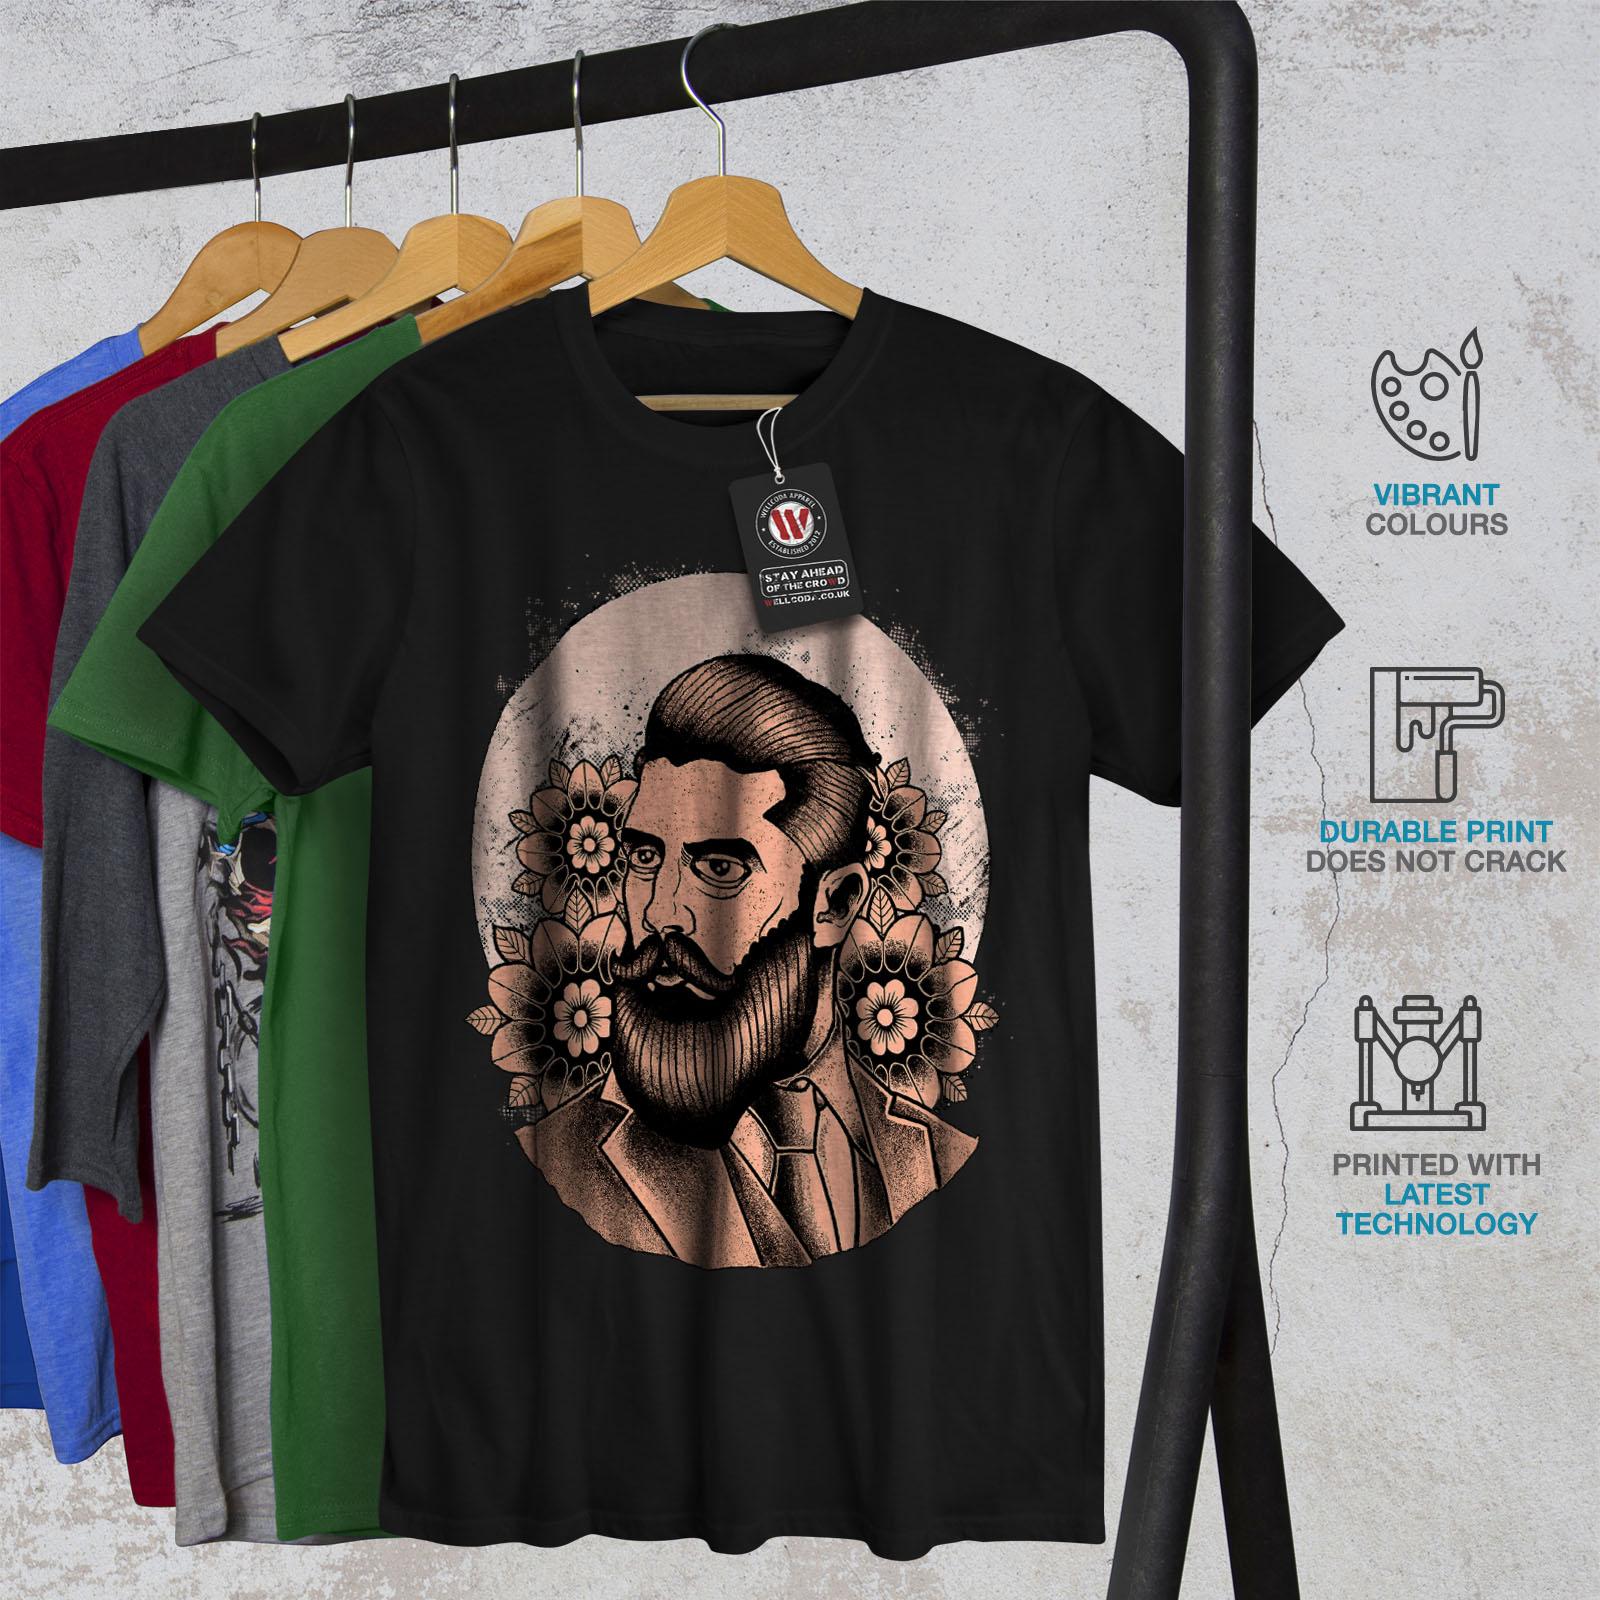 Wellcoda-Beard-Hipster-Mens-T-shirt-Grooming-Graphic-Design-Printed-Tee